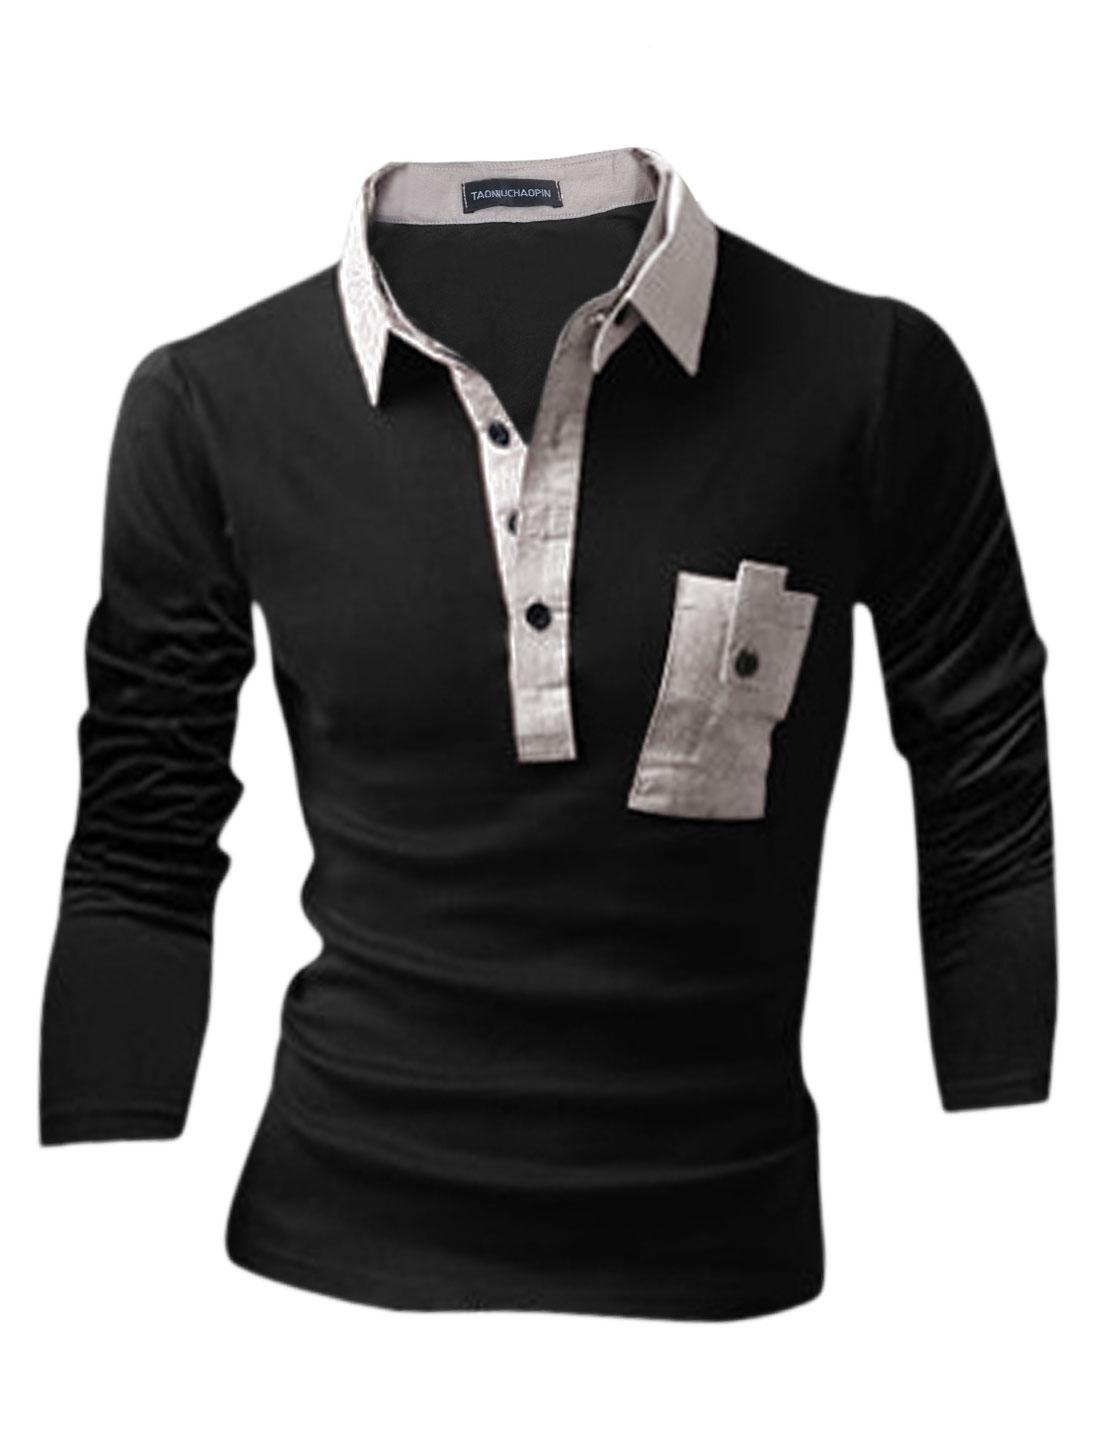 Men Button Closed Upper Detachable Turn Down Collar Polo Shirt Black M